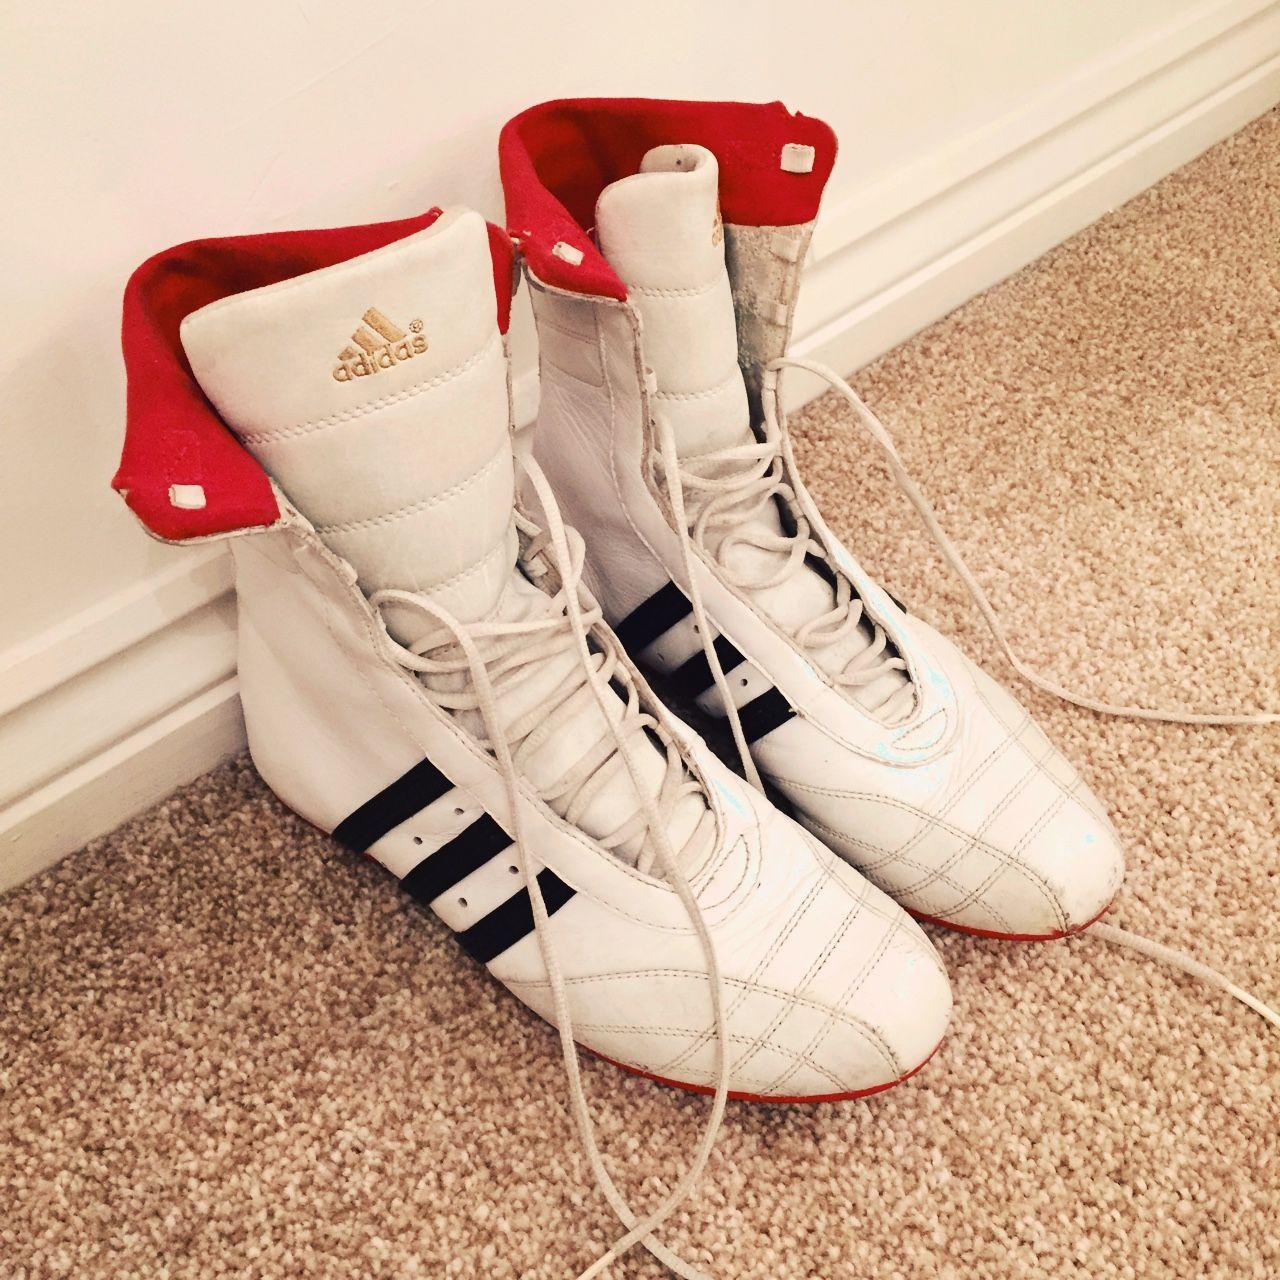 Depop | Boxing boots, Adidas women